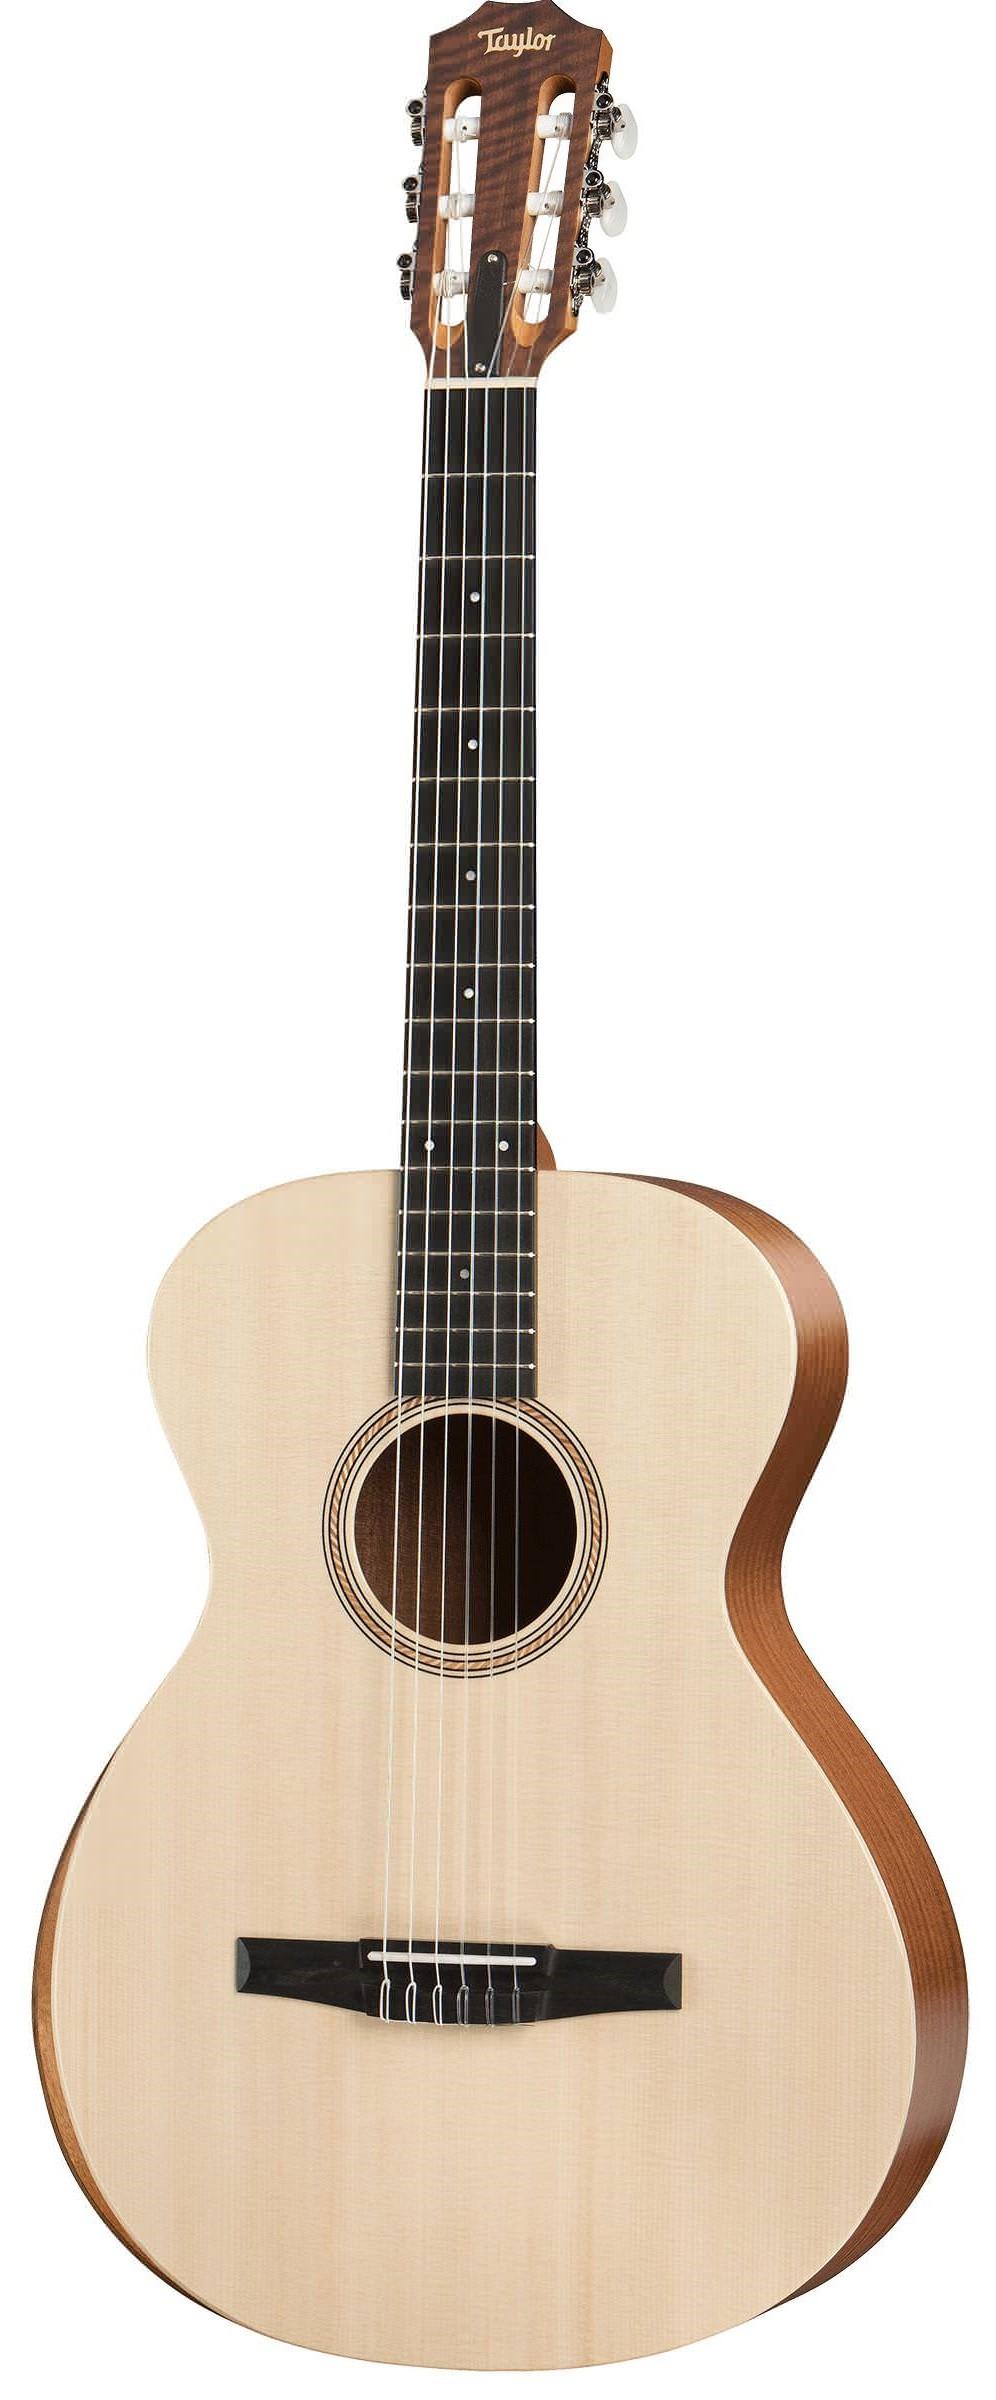 Акустическая гитара Taylor Academy 12-N Academy Series Layered Sapele Sitka Spruce Top Nylon String Grand Concert